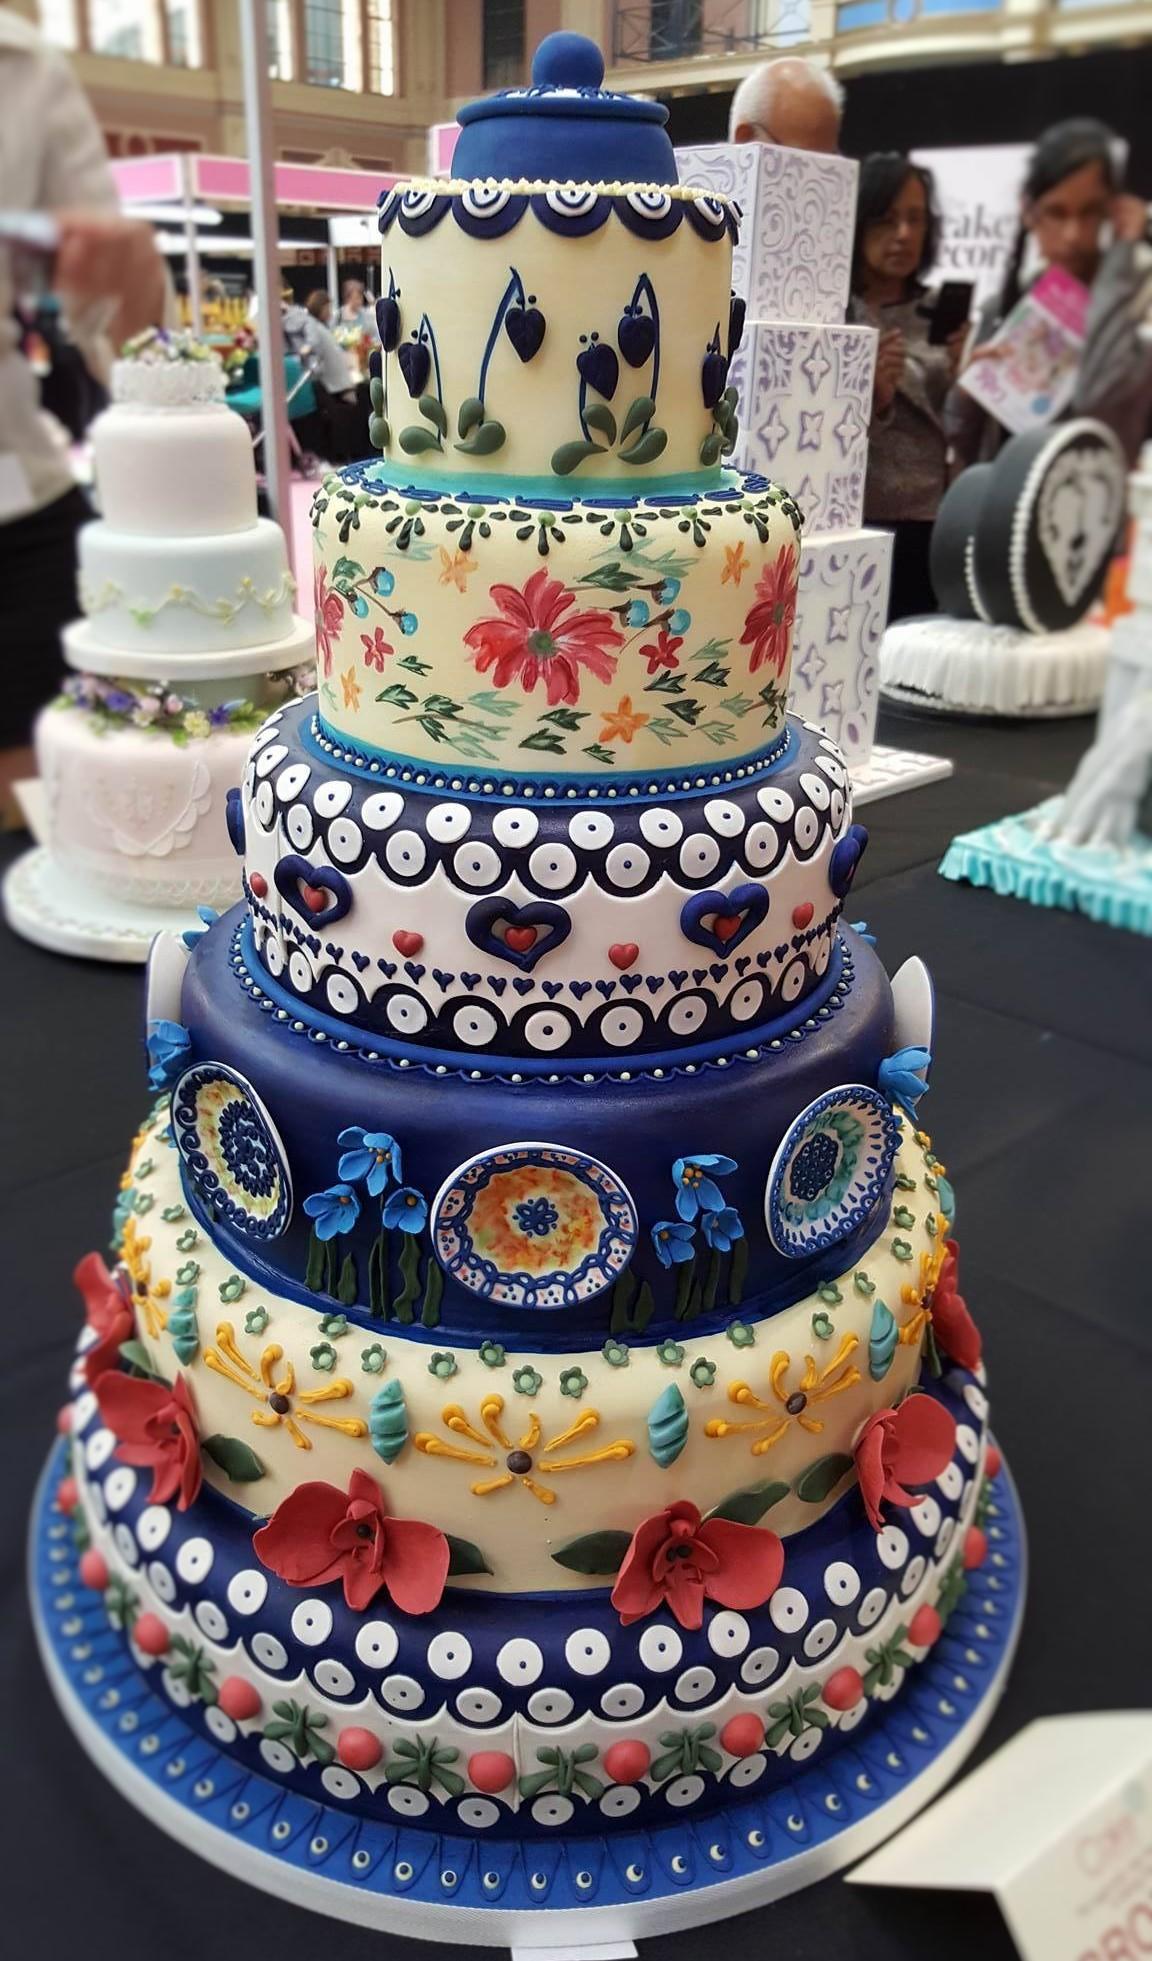 Wedding Cake Inspiration - Delft